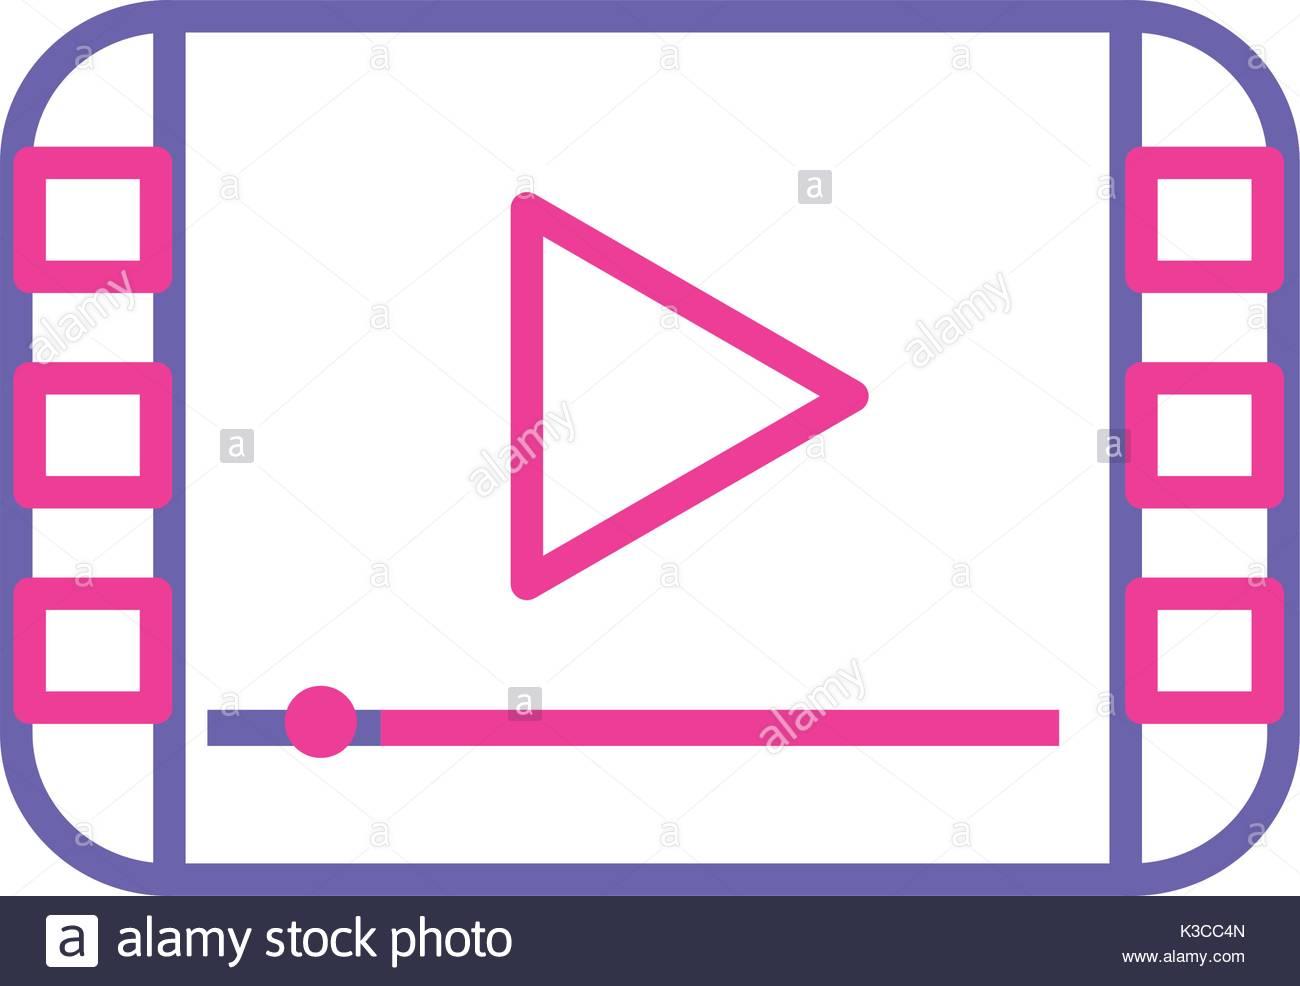 1300x986 Silhouette Video Digital Play Media Screen Stock Vector Art